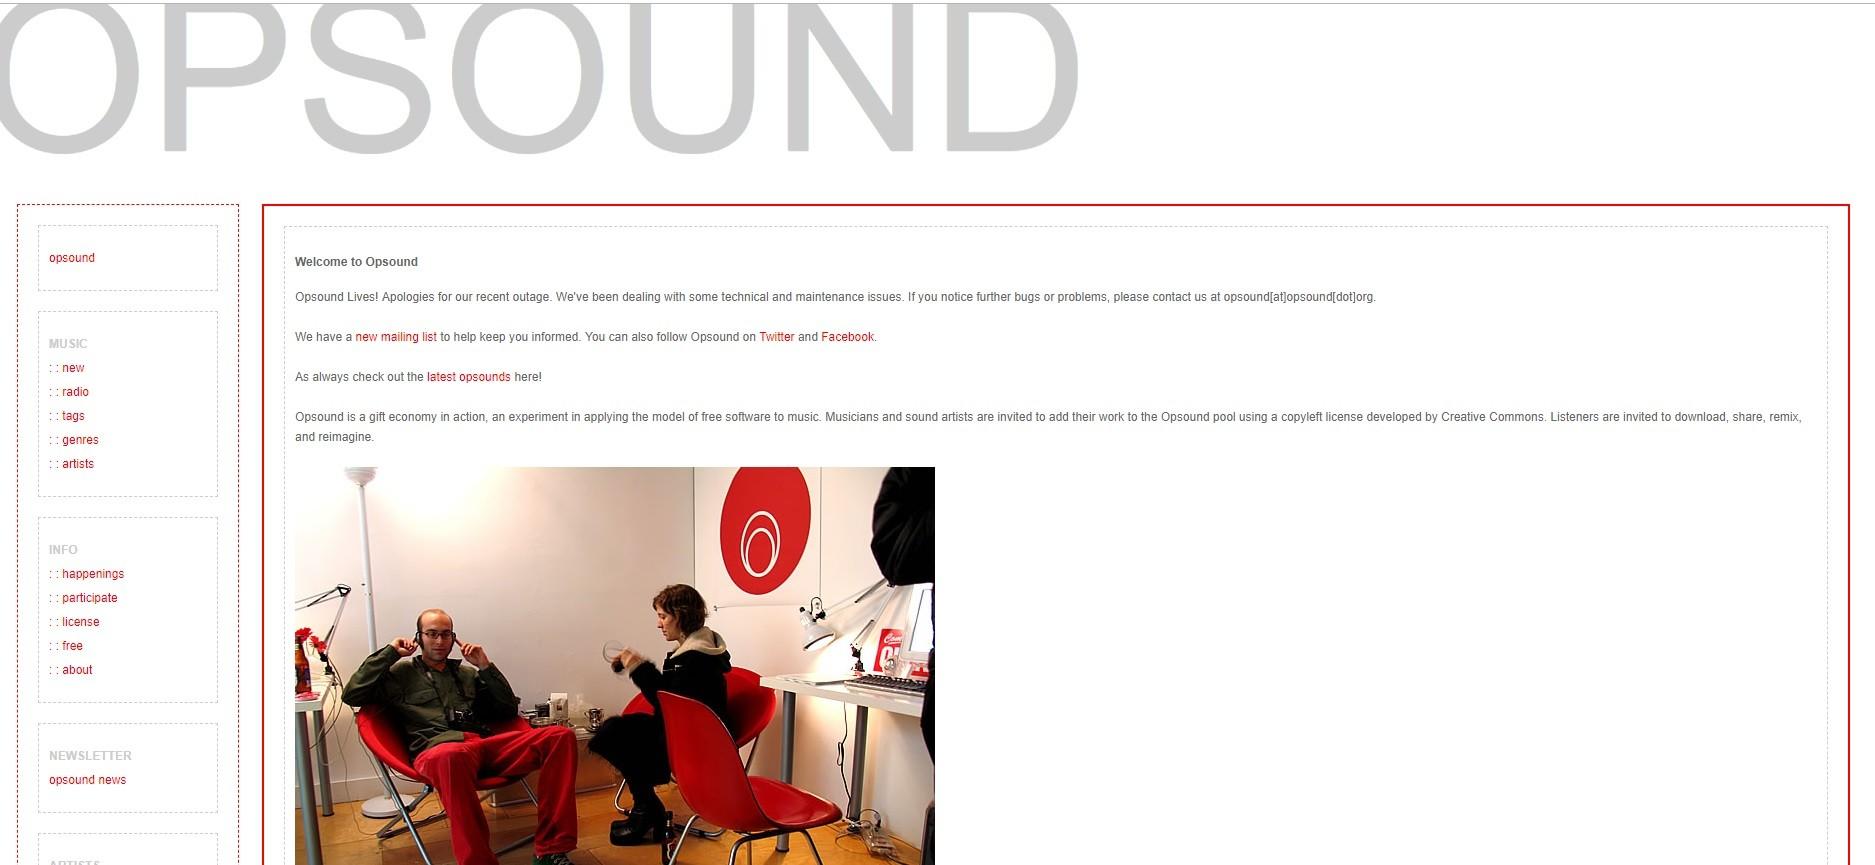 En Opsound puedes descargar música gratis para YouTube